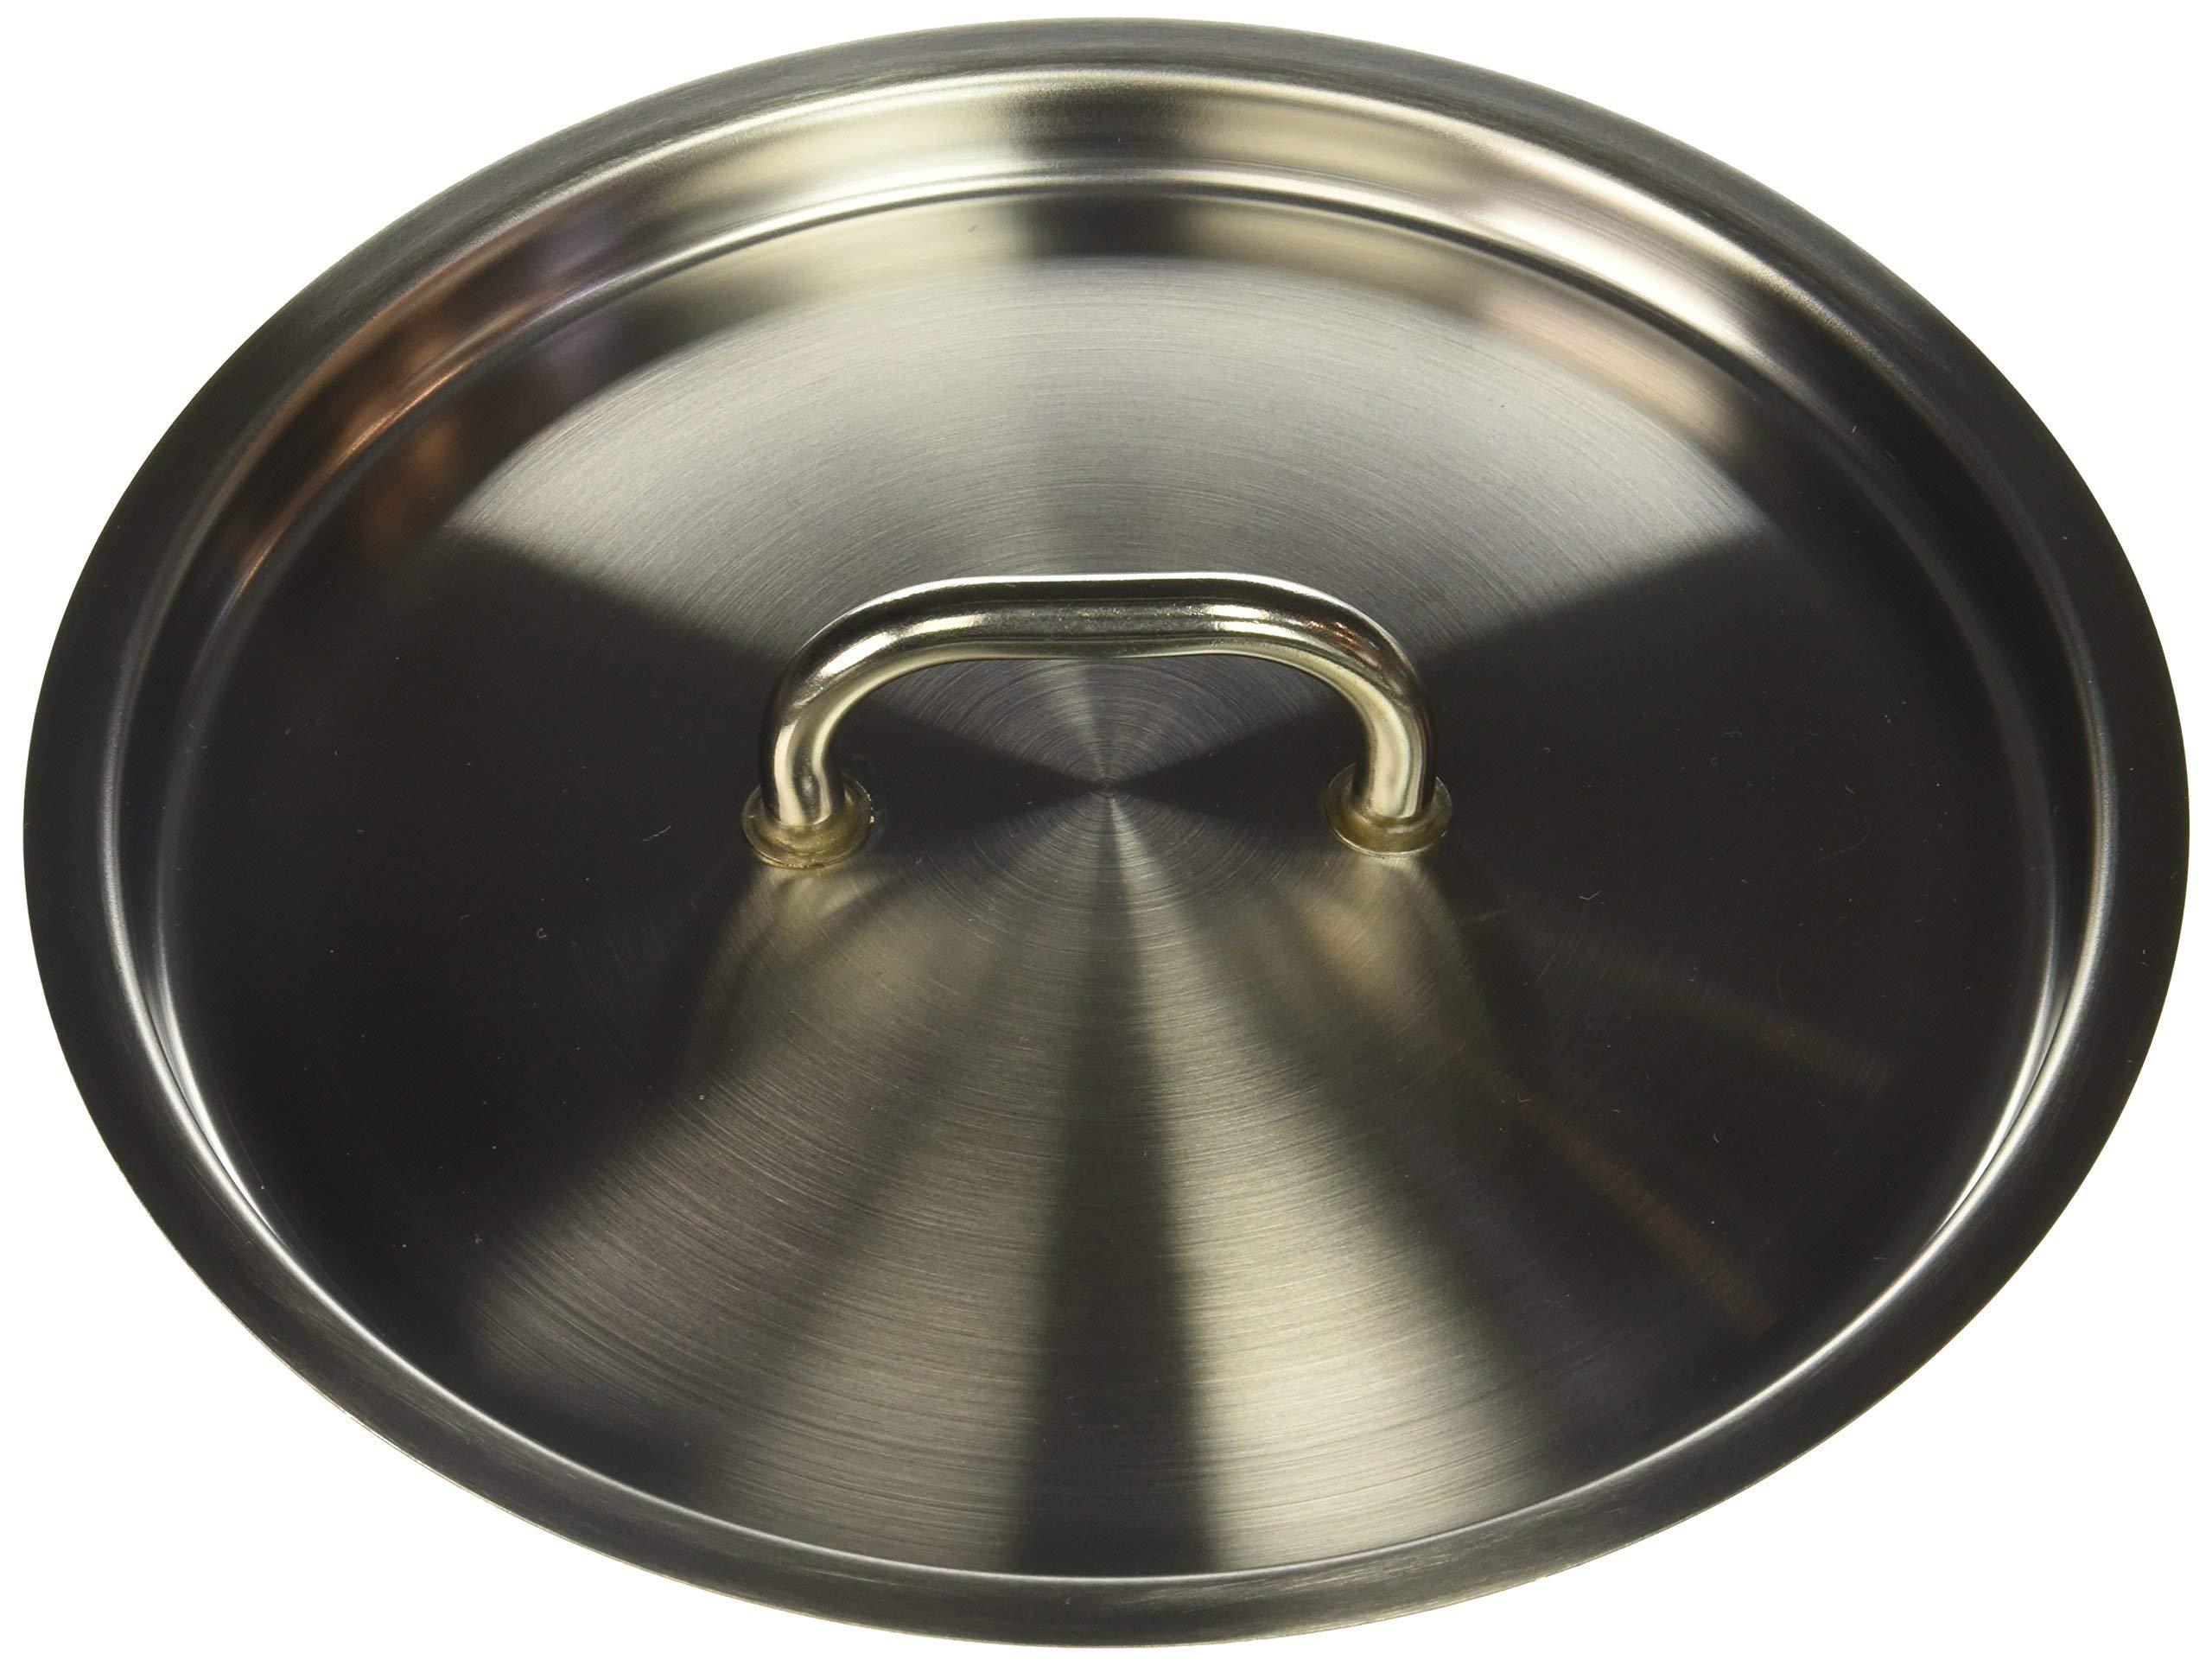 Matfer Bourgeat Lid for Matfer Cookware, 9 1/2-Inch, Gray